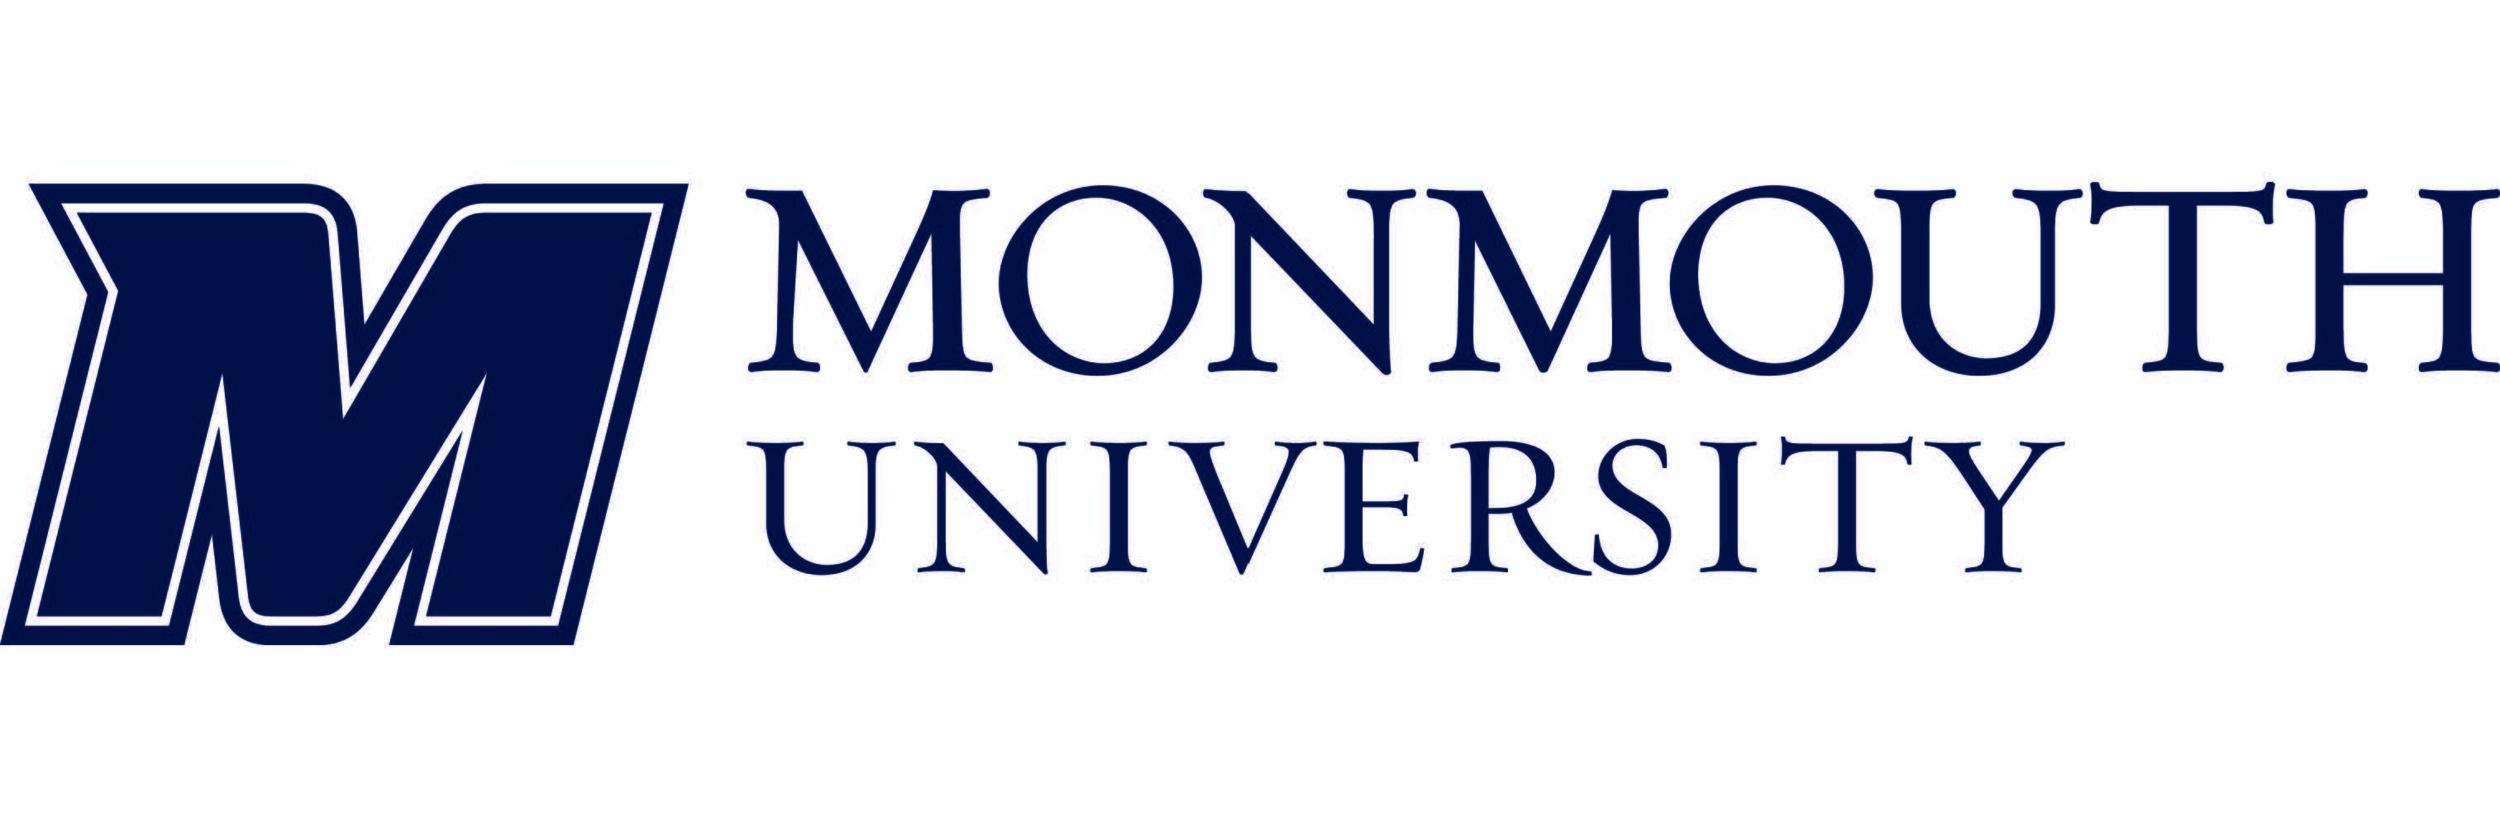 Monmouth-University-Polling-Logo.jpg